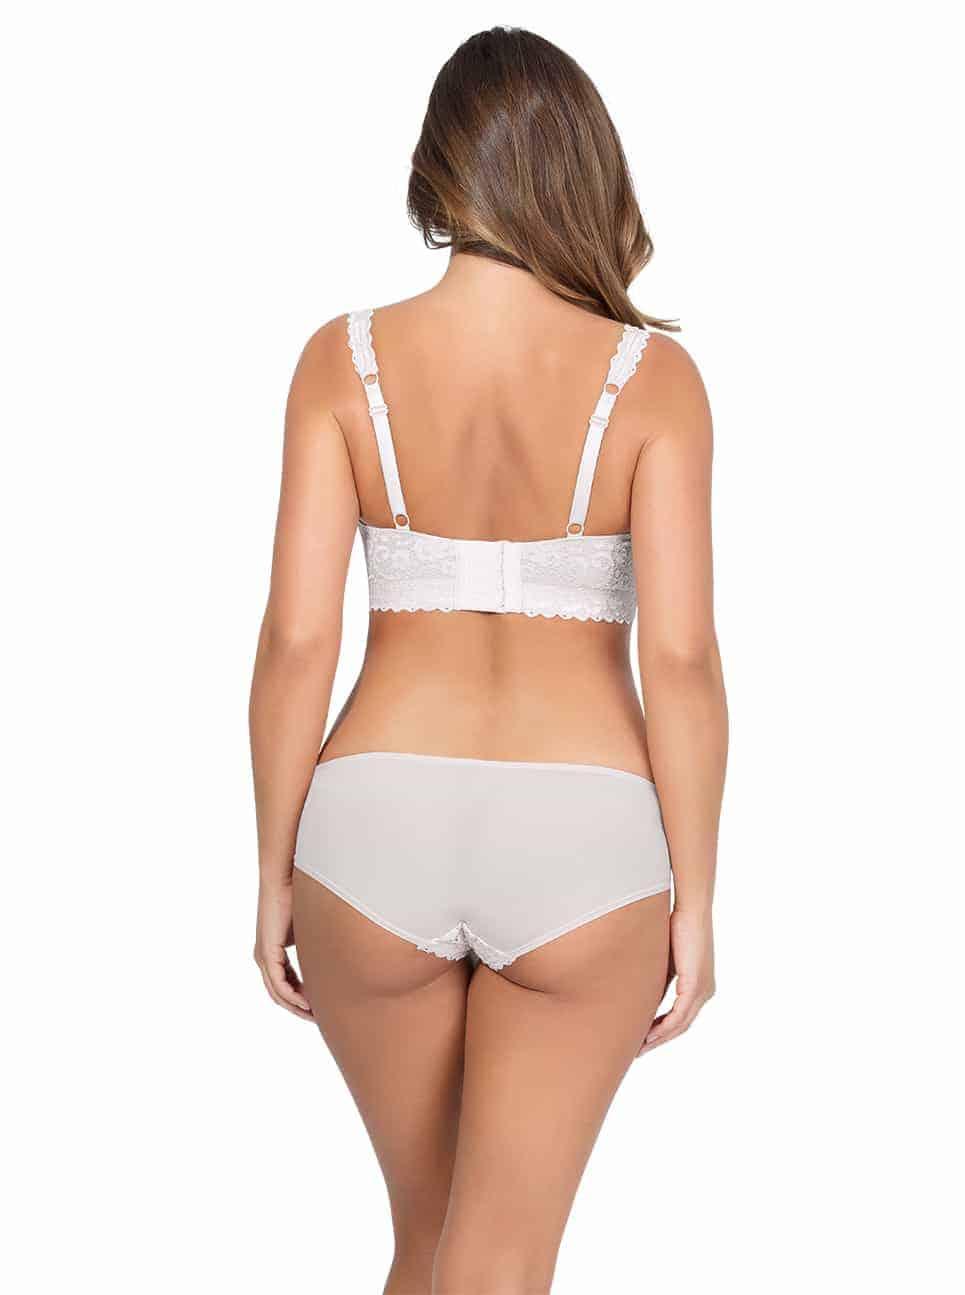 PARFAIT Adriana LaceBraletteP5482 BikiniP5483 PearlWhite Back copy 2 - Adriana Bikini - Pearl White - P5483